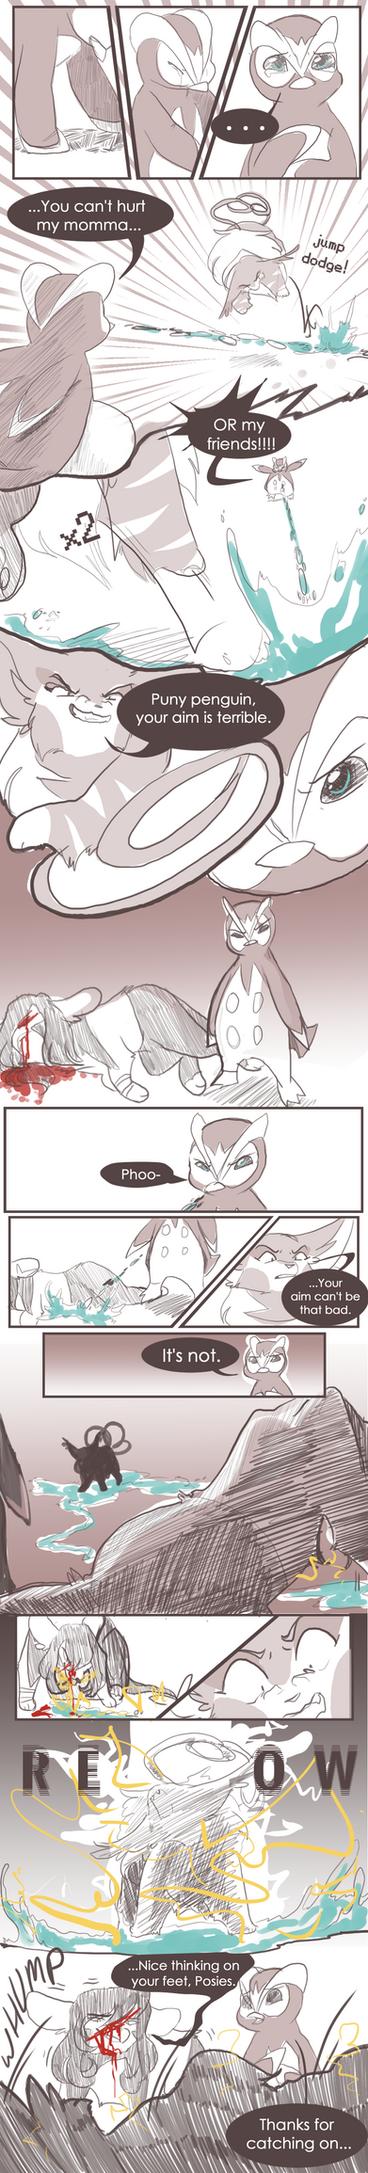 Lissylocke page 20 by Skitea